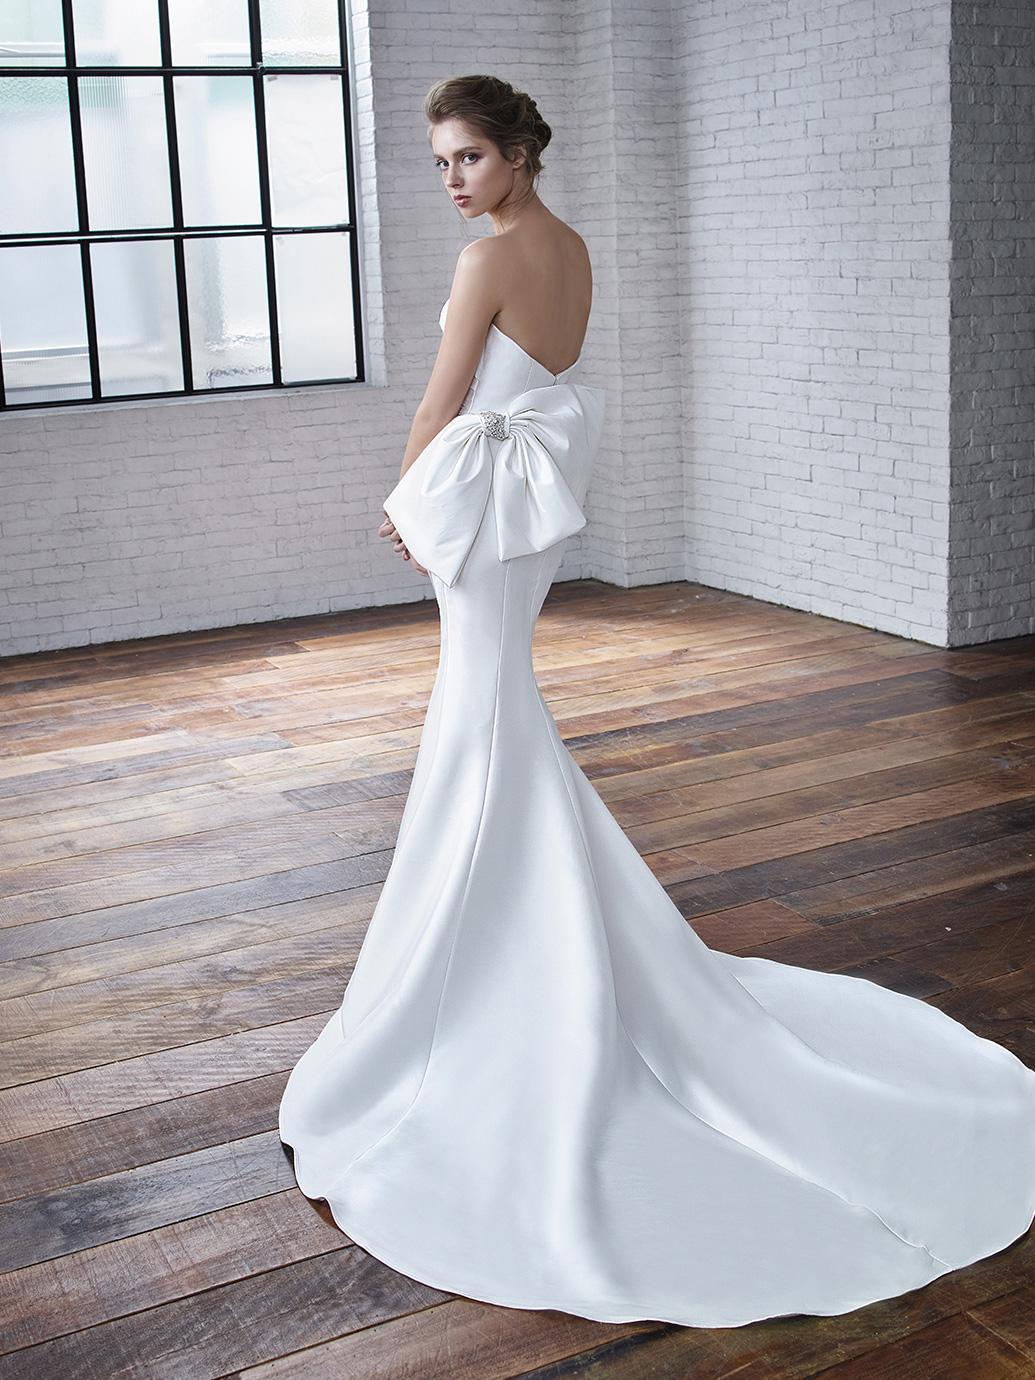 BM_Bride_2019_Pro_Carmen_Bac_Web.jpg